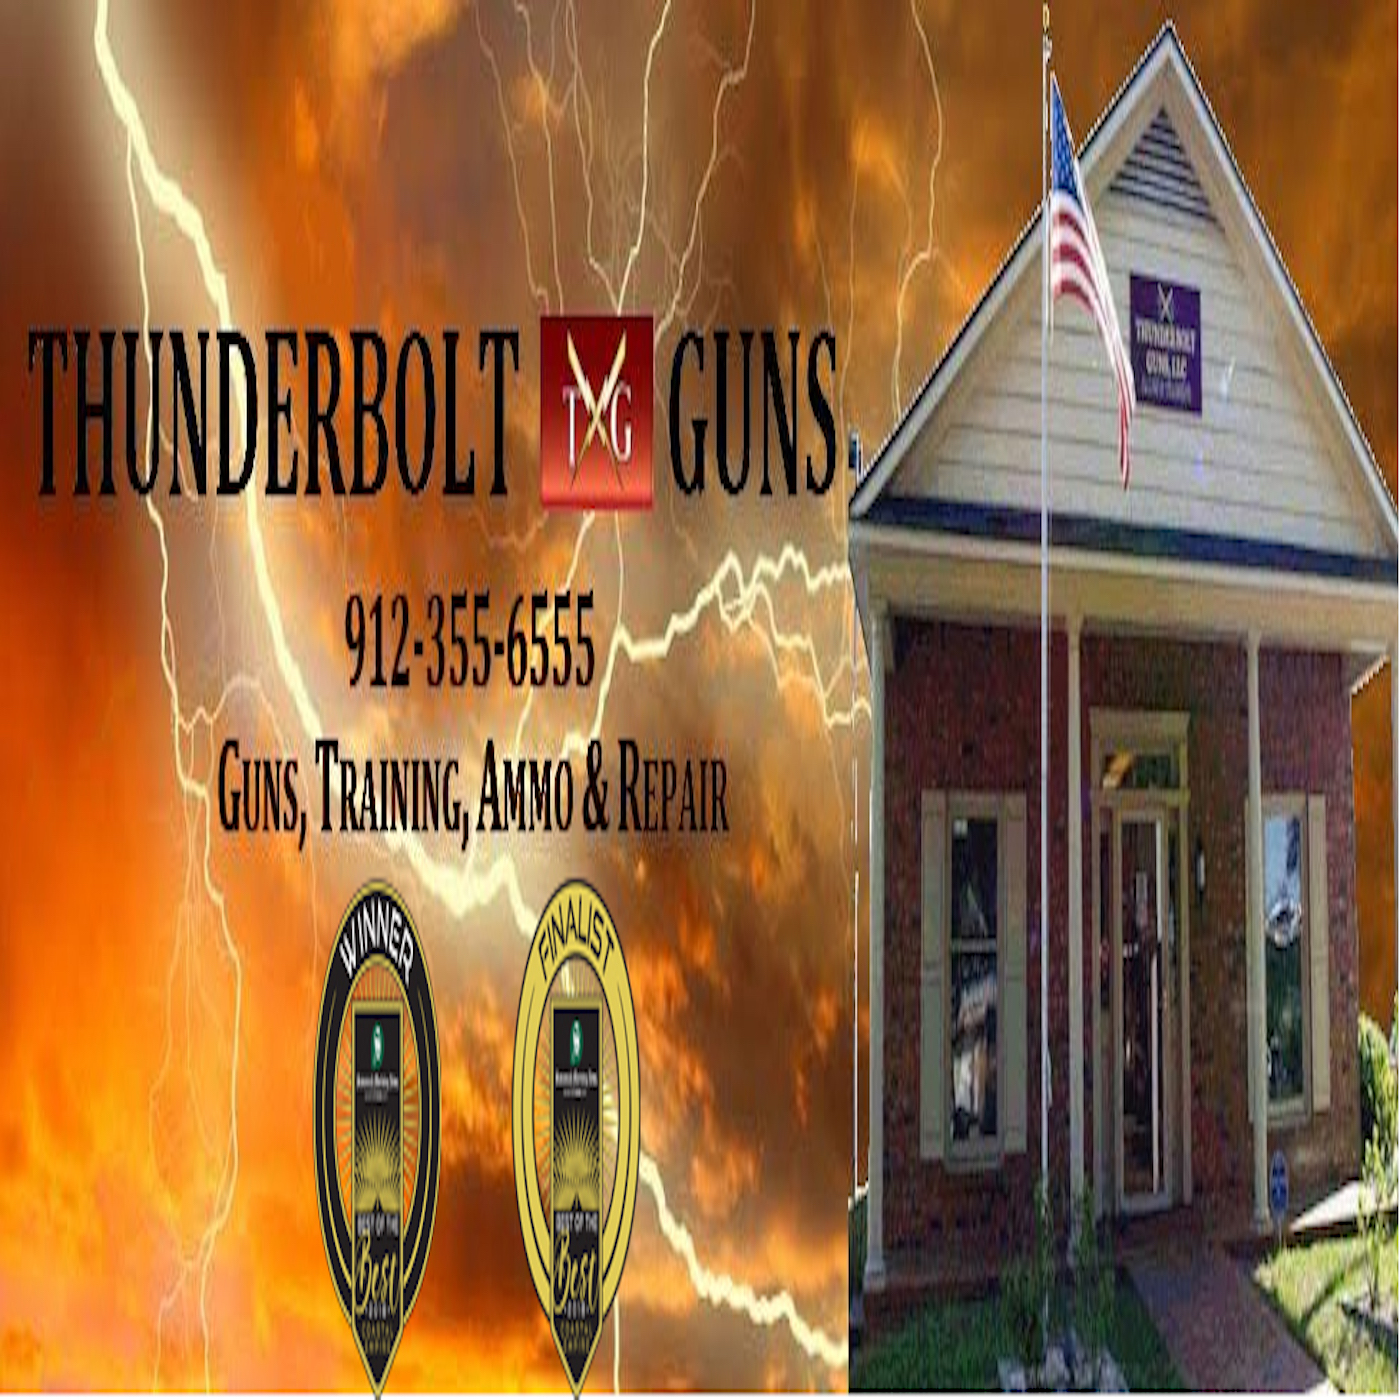 Thunderbolt Guns Radio Libsyn Directory Nevertheless, the plan remains the same, i think it's not for long. thunderbolt guns radio libsyn directory